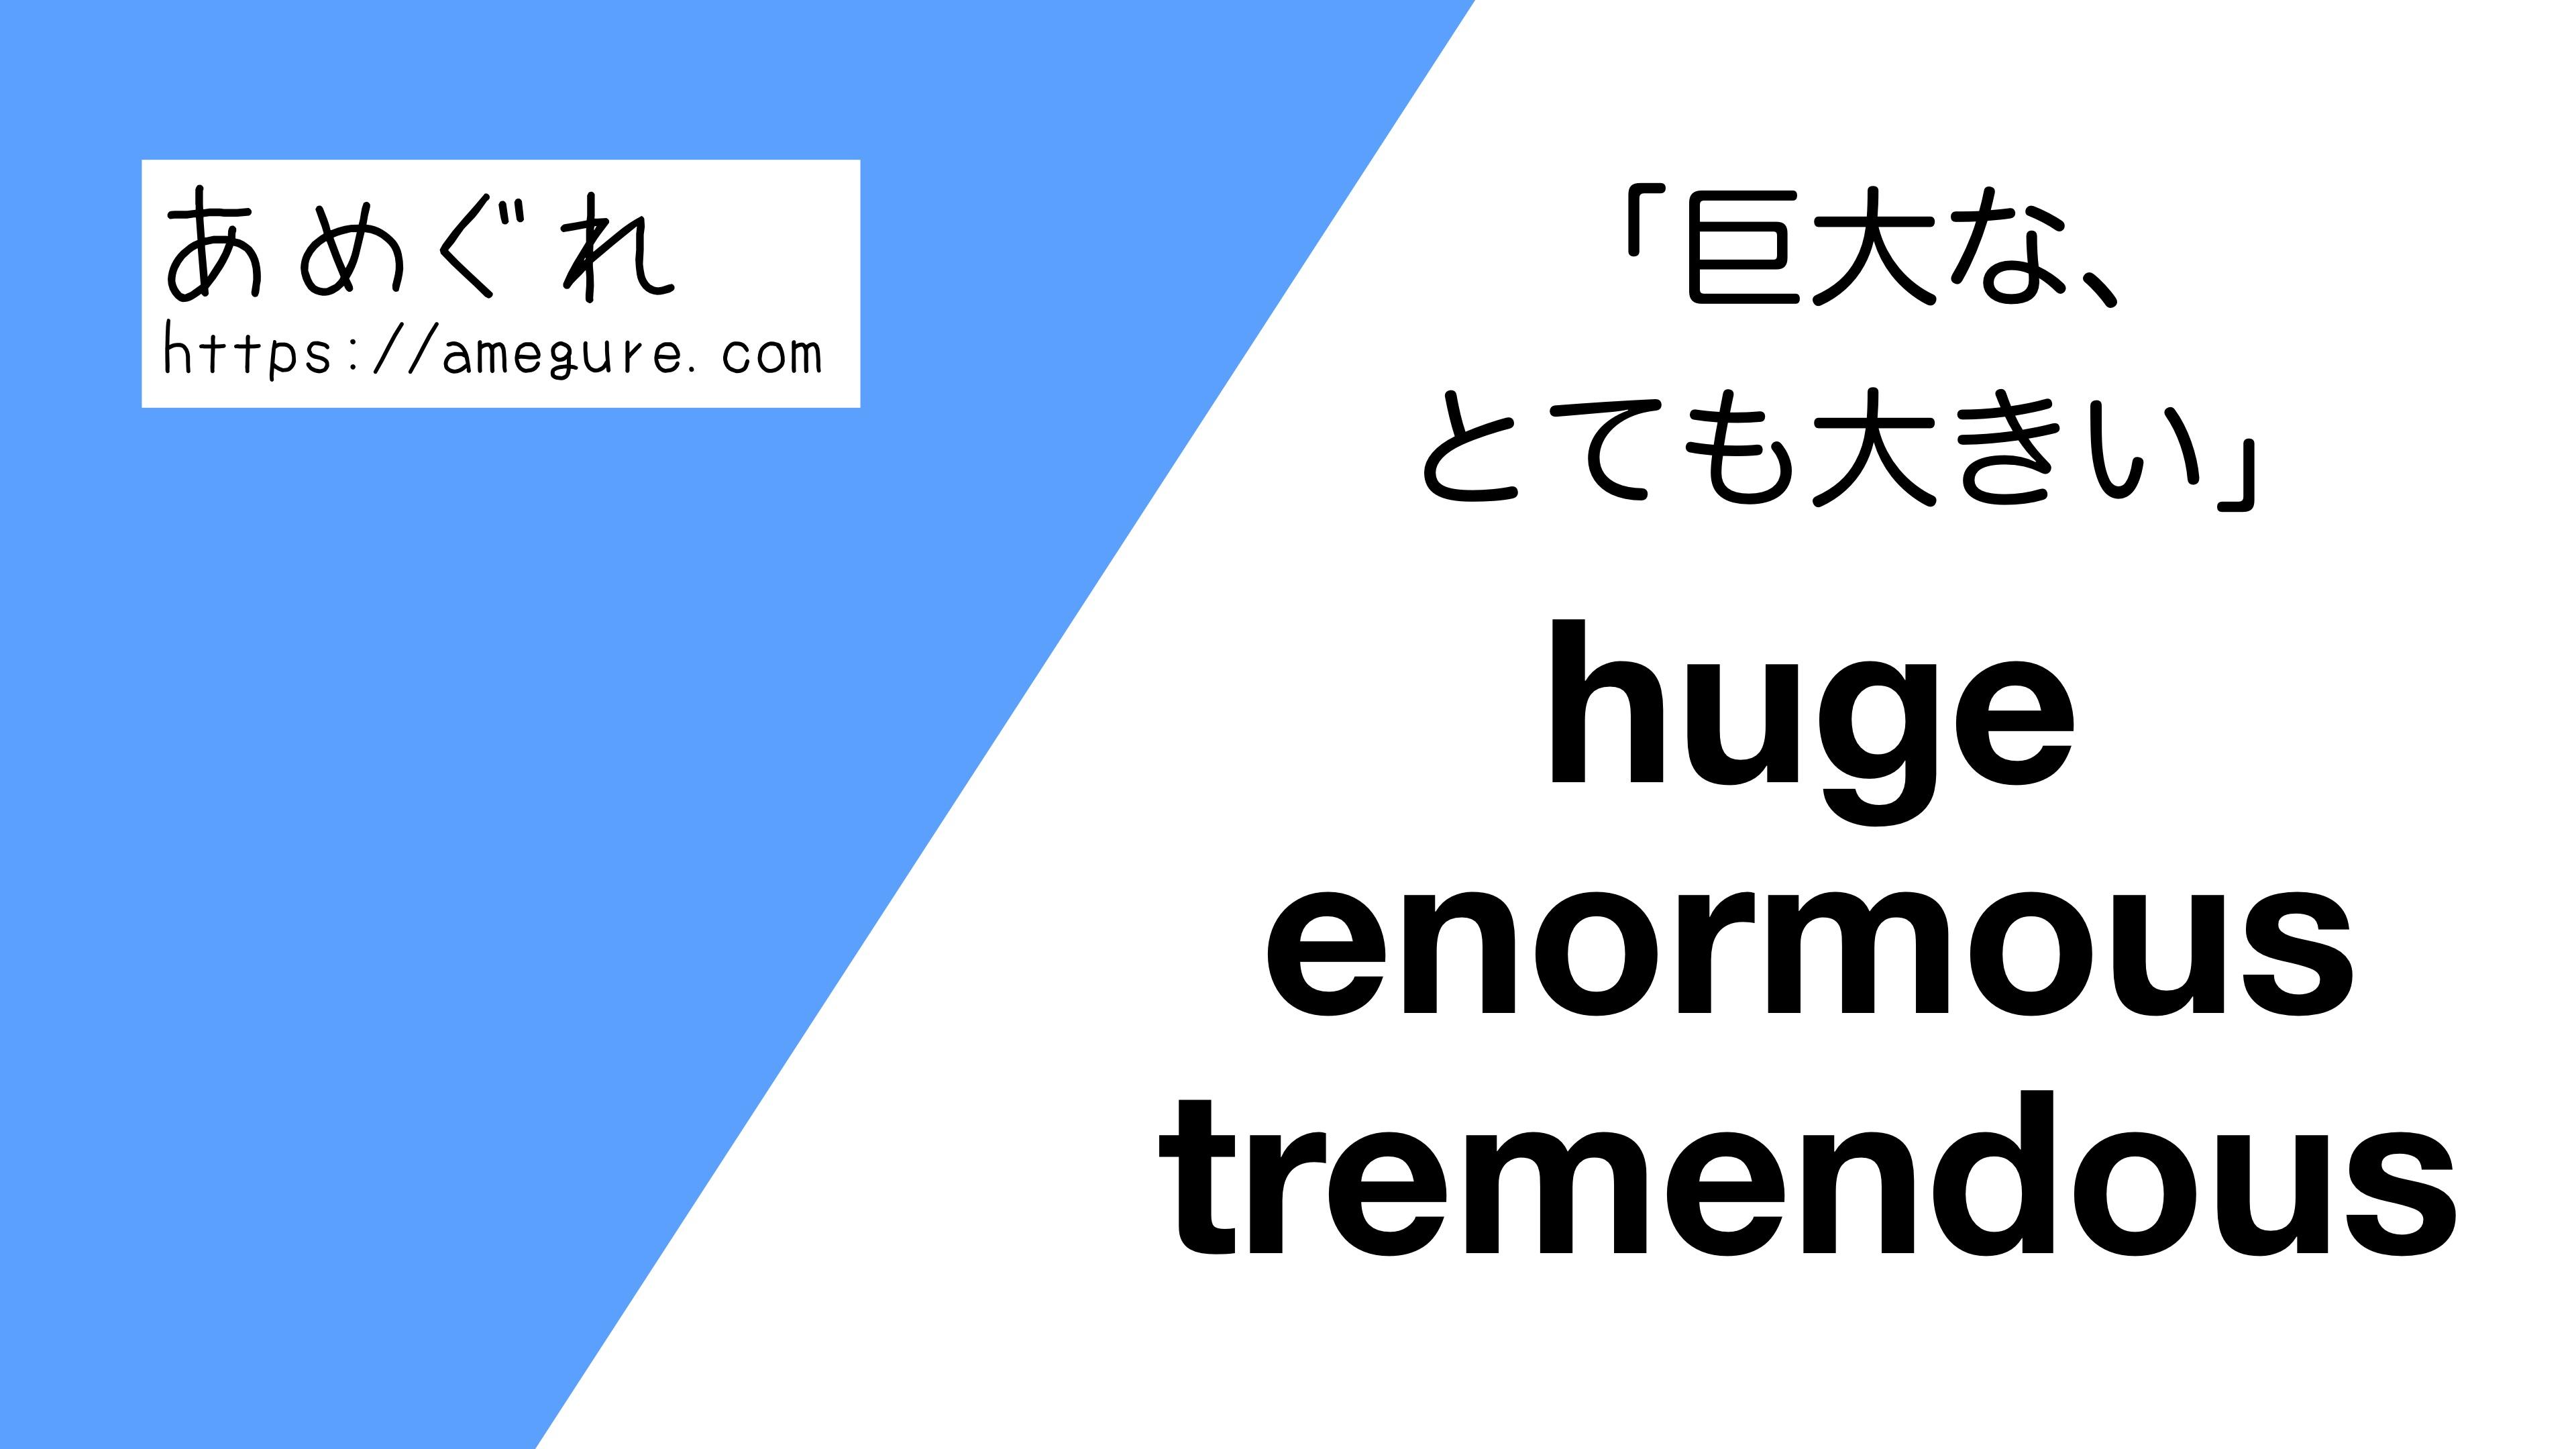 huge-enormous-tremendous違い